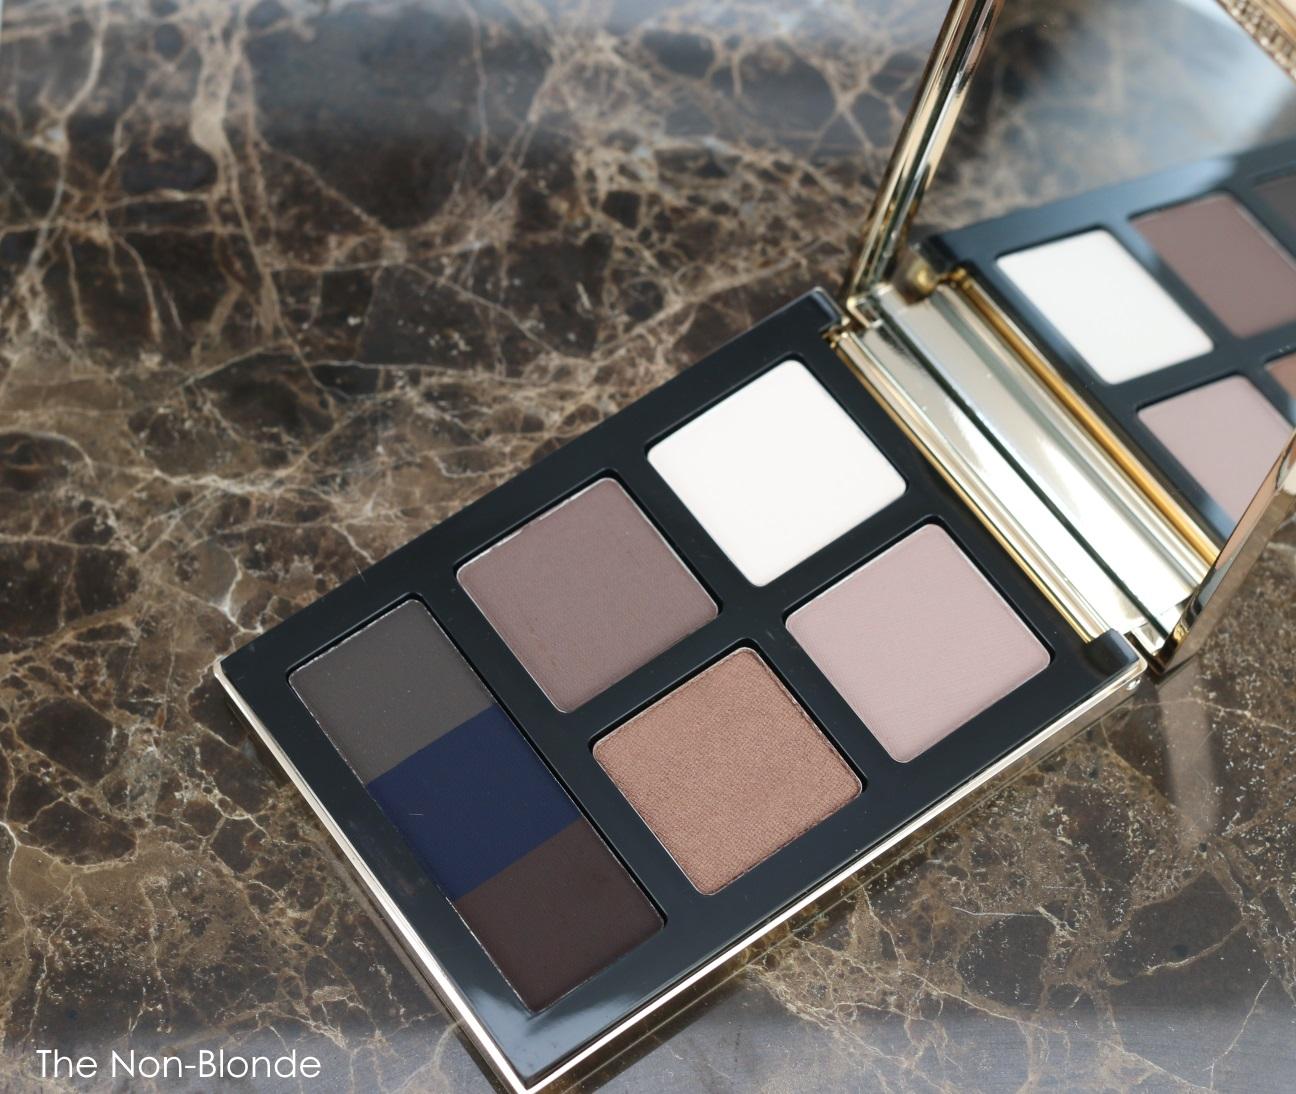 Bobbi Brown Chocolate Eye Palette 2016 Edition The Non